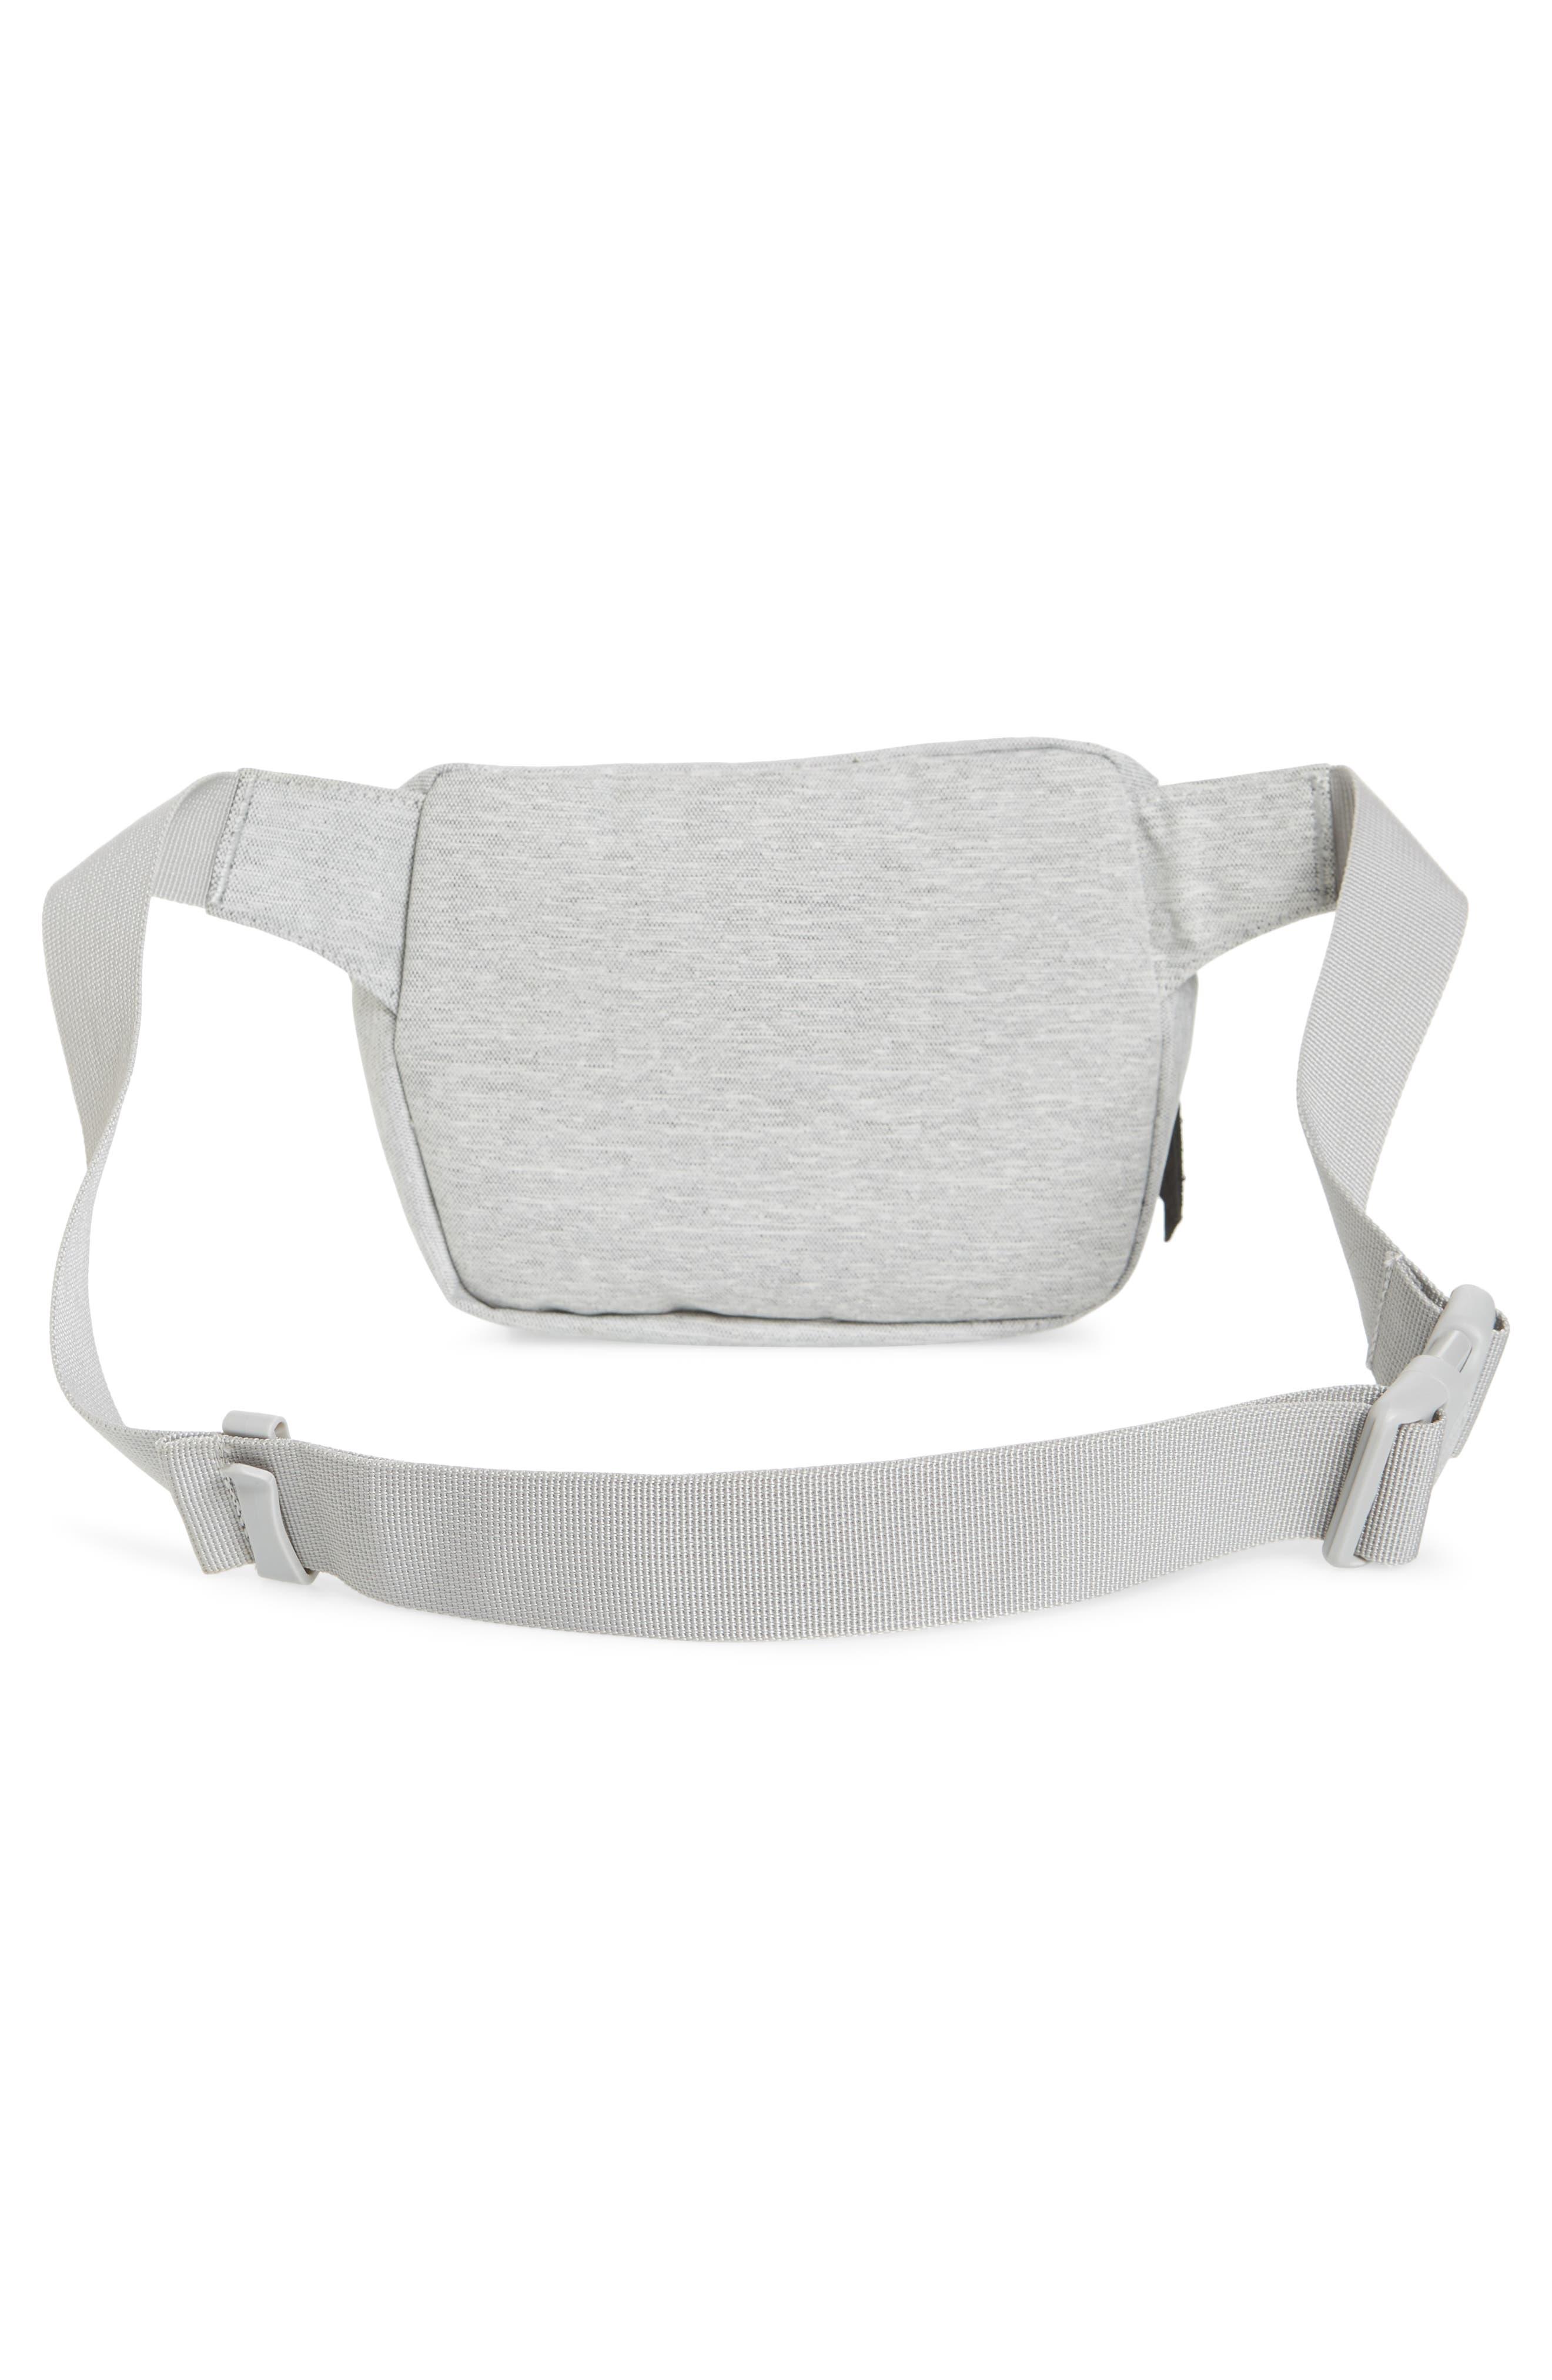 Fifteen Belt Bag,                             Alternate thumbnail 6, color,                             Light Grey